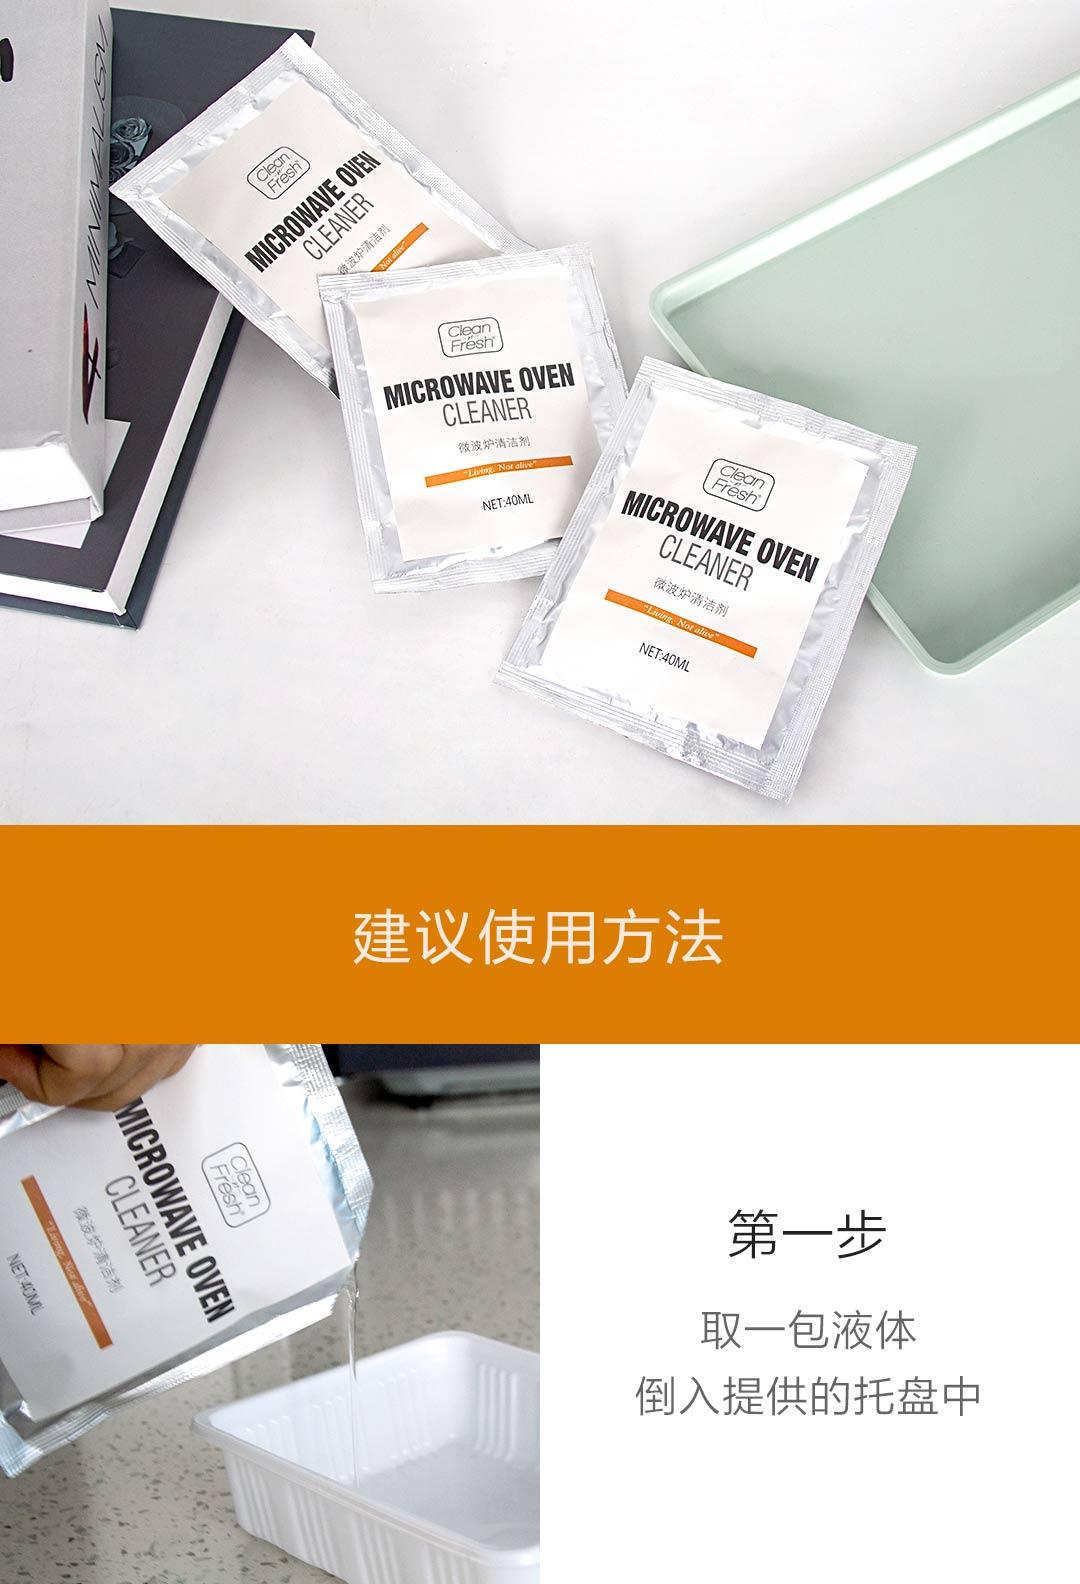 product_奇妙_科林青香微波炉清洁剂